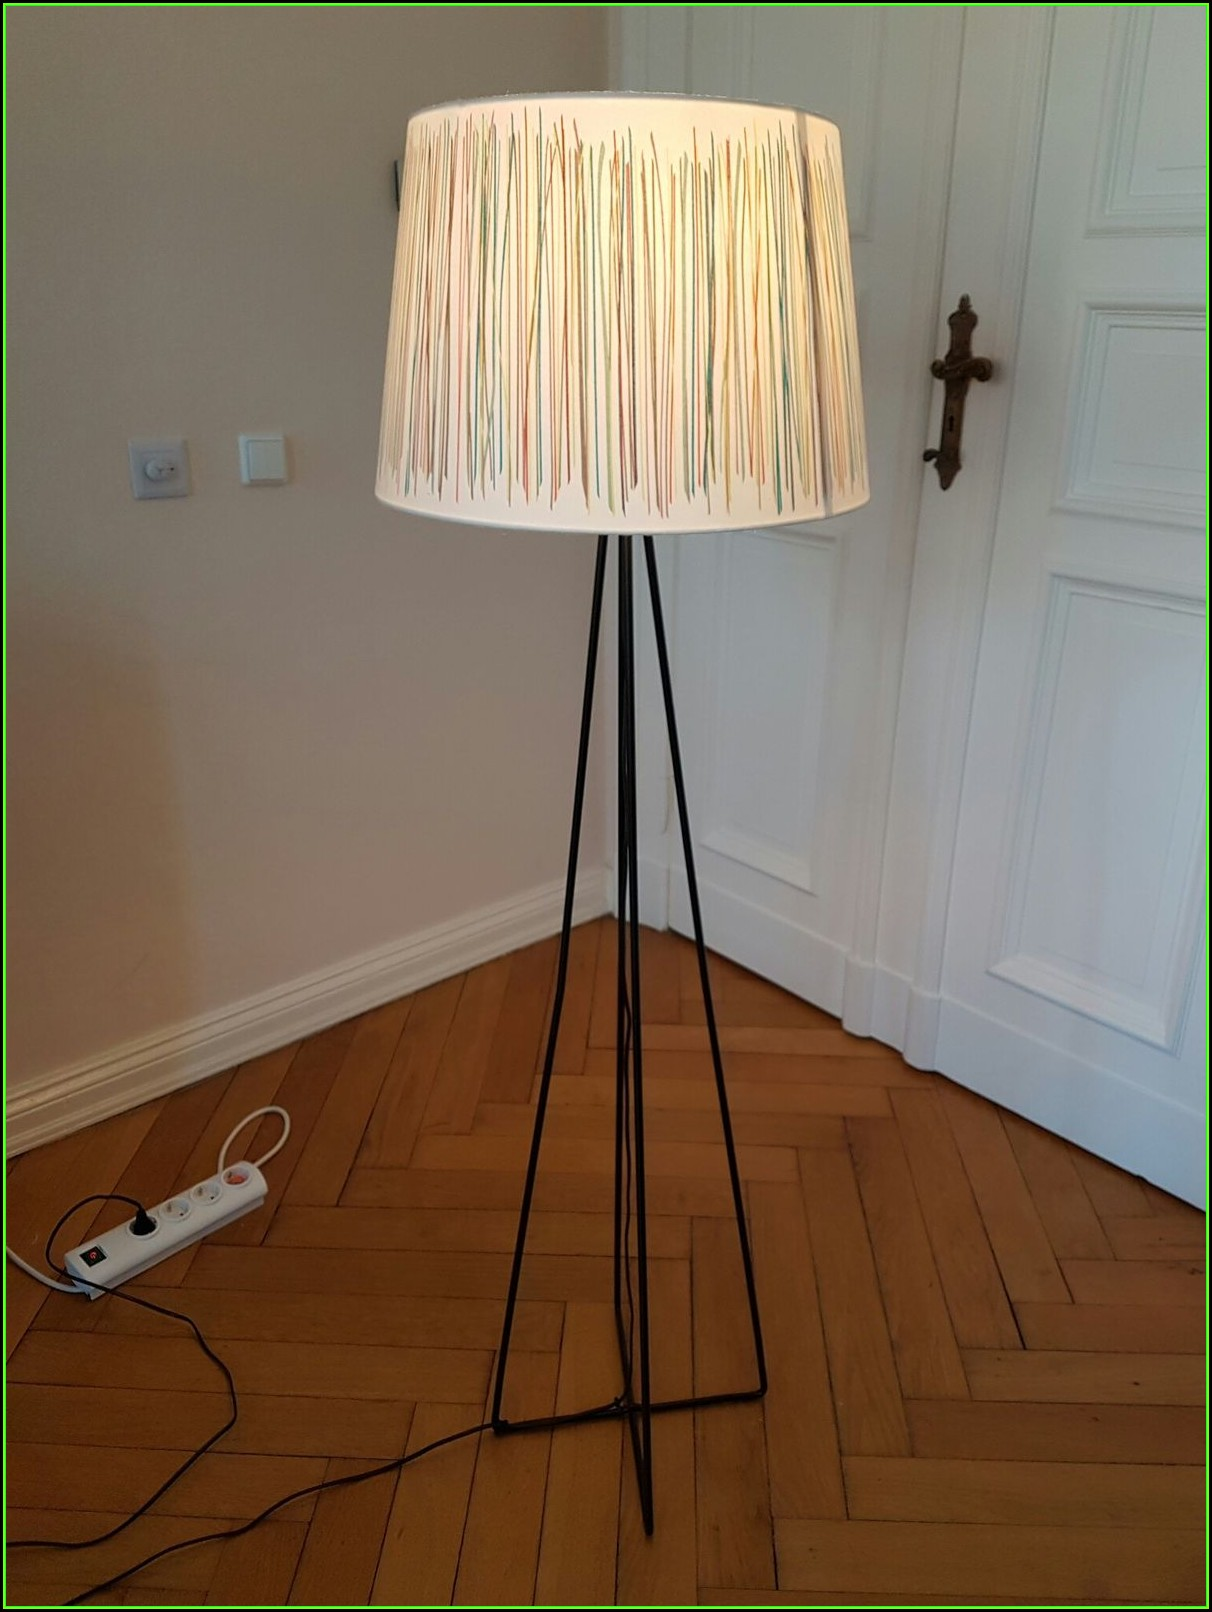 Stehlampe Kinderzimmer Ikea